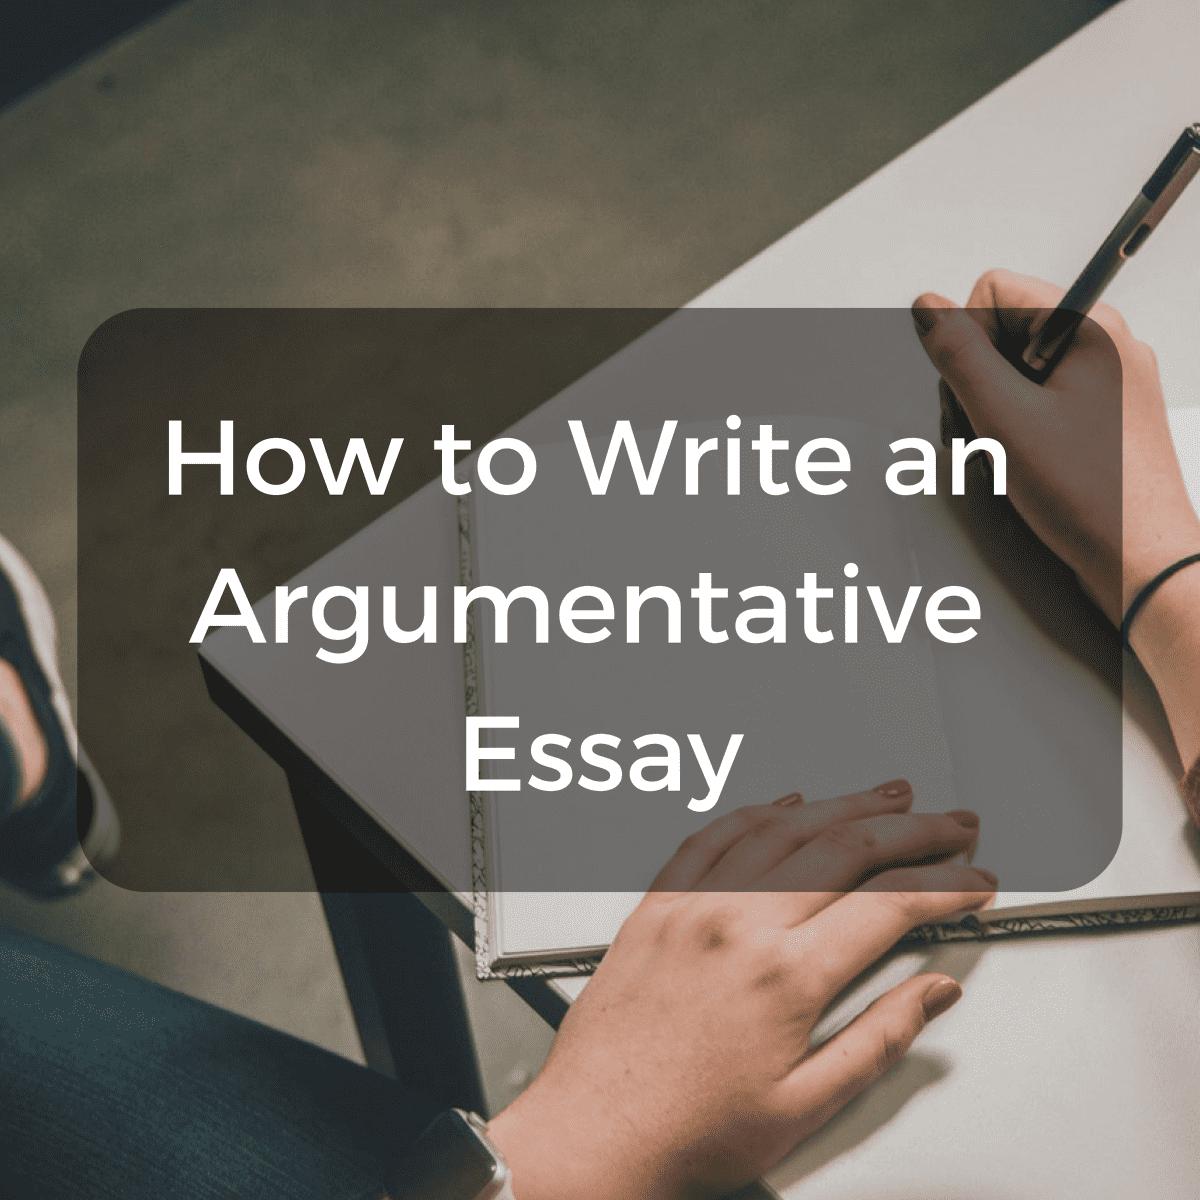 Argumentative essay marriage divorce science vs art essay